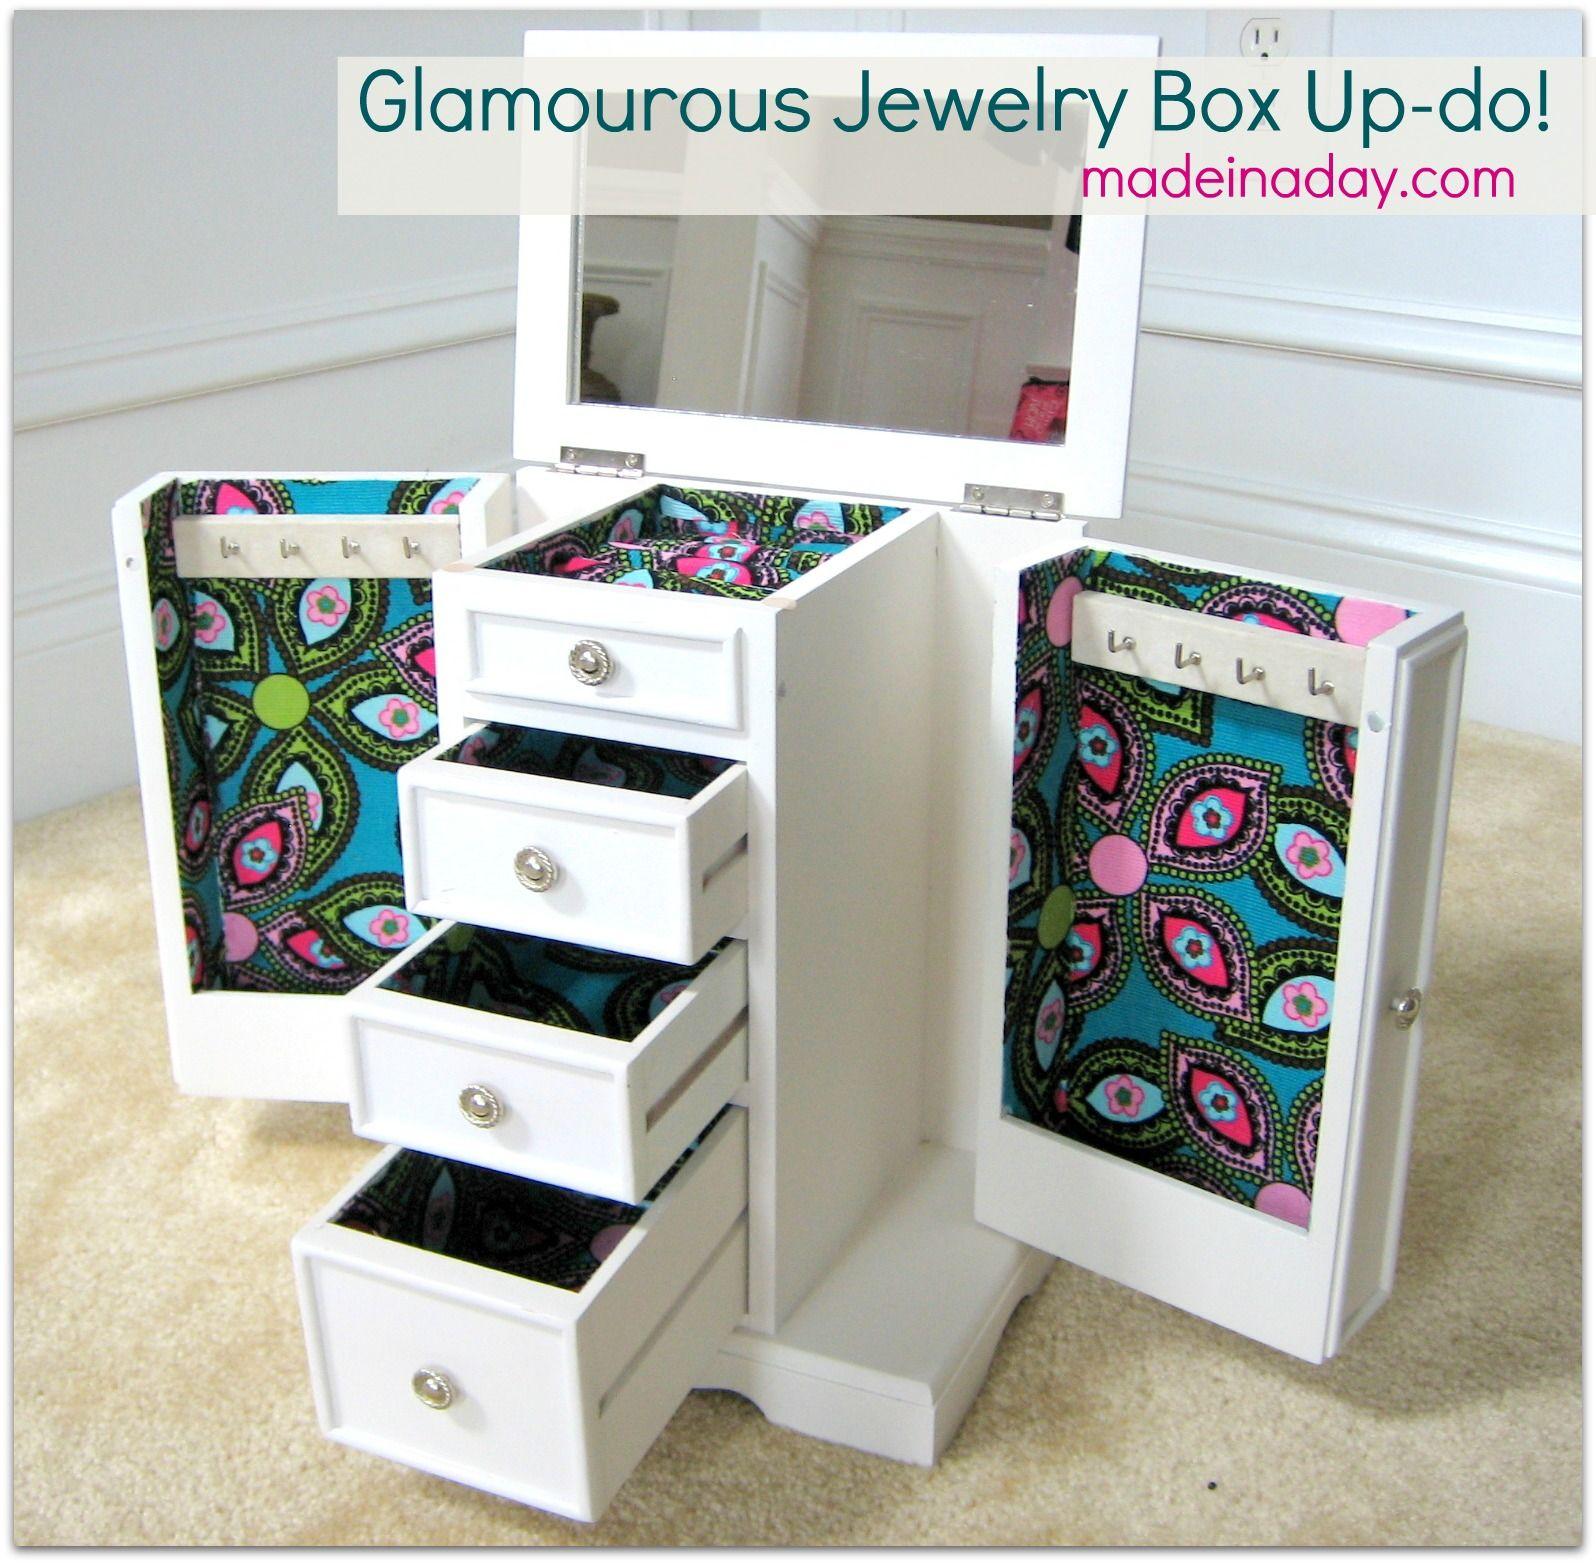 Teen Jewelry Box Jewelry Box Updo With Mod Podge & Fabric  Jewelry Box  Pinterest